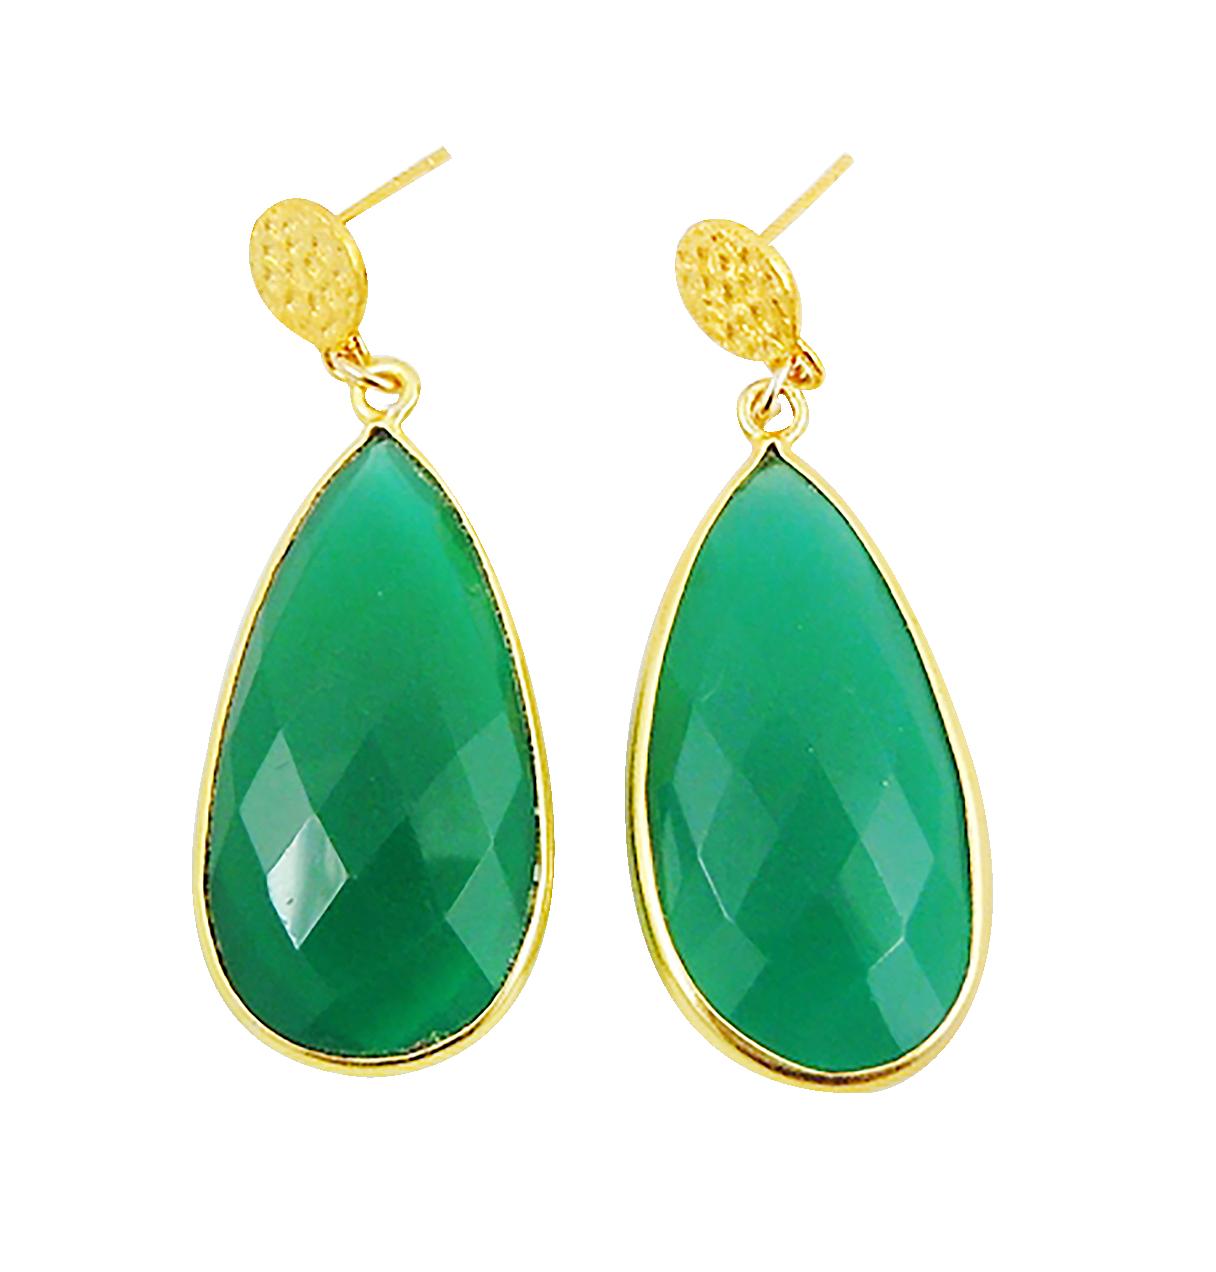 Custom Made House Of Zada 24kt Gold Vermeil Hammertone Green Onyx Statement Earrings